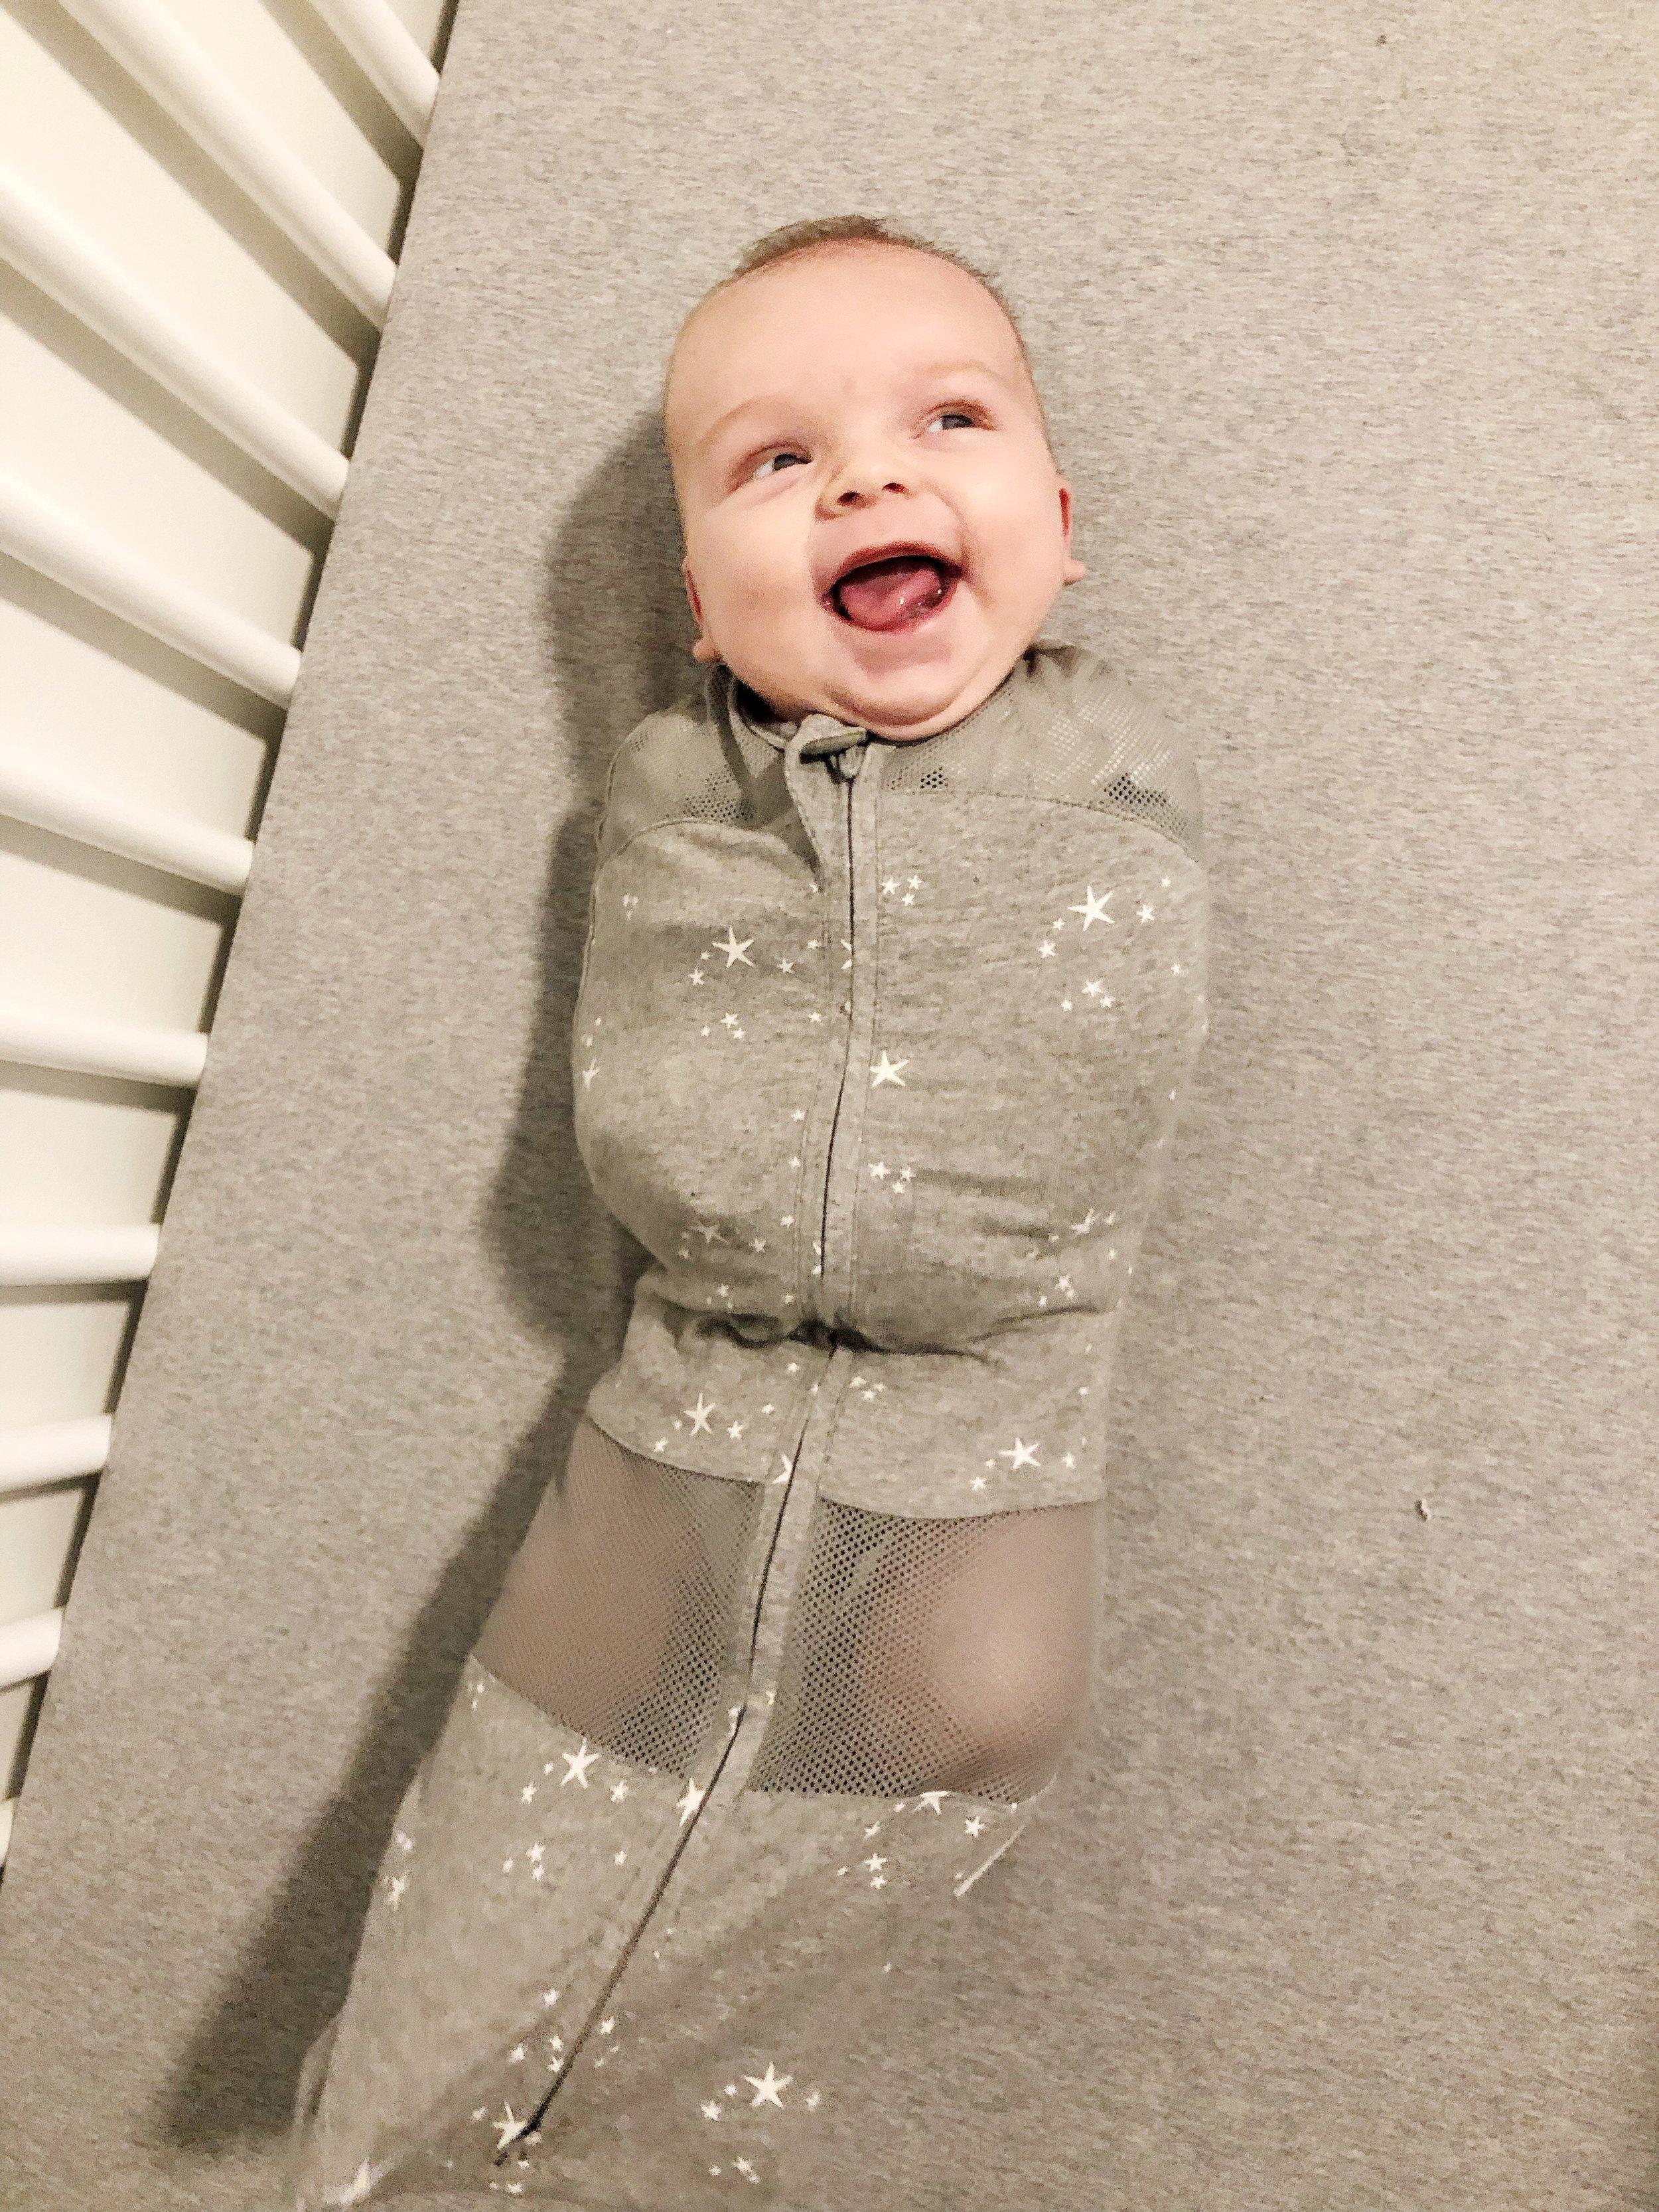 He loves his sleep sack!